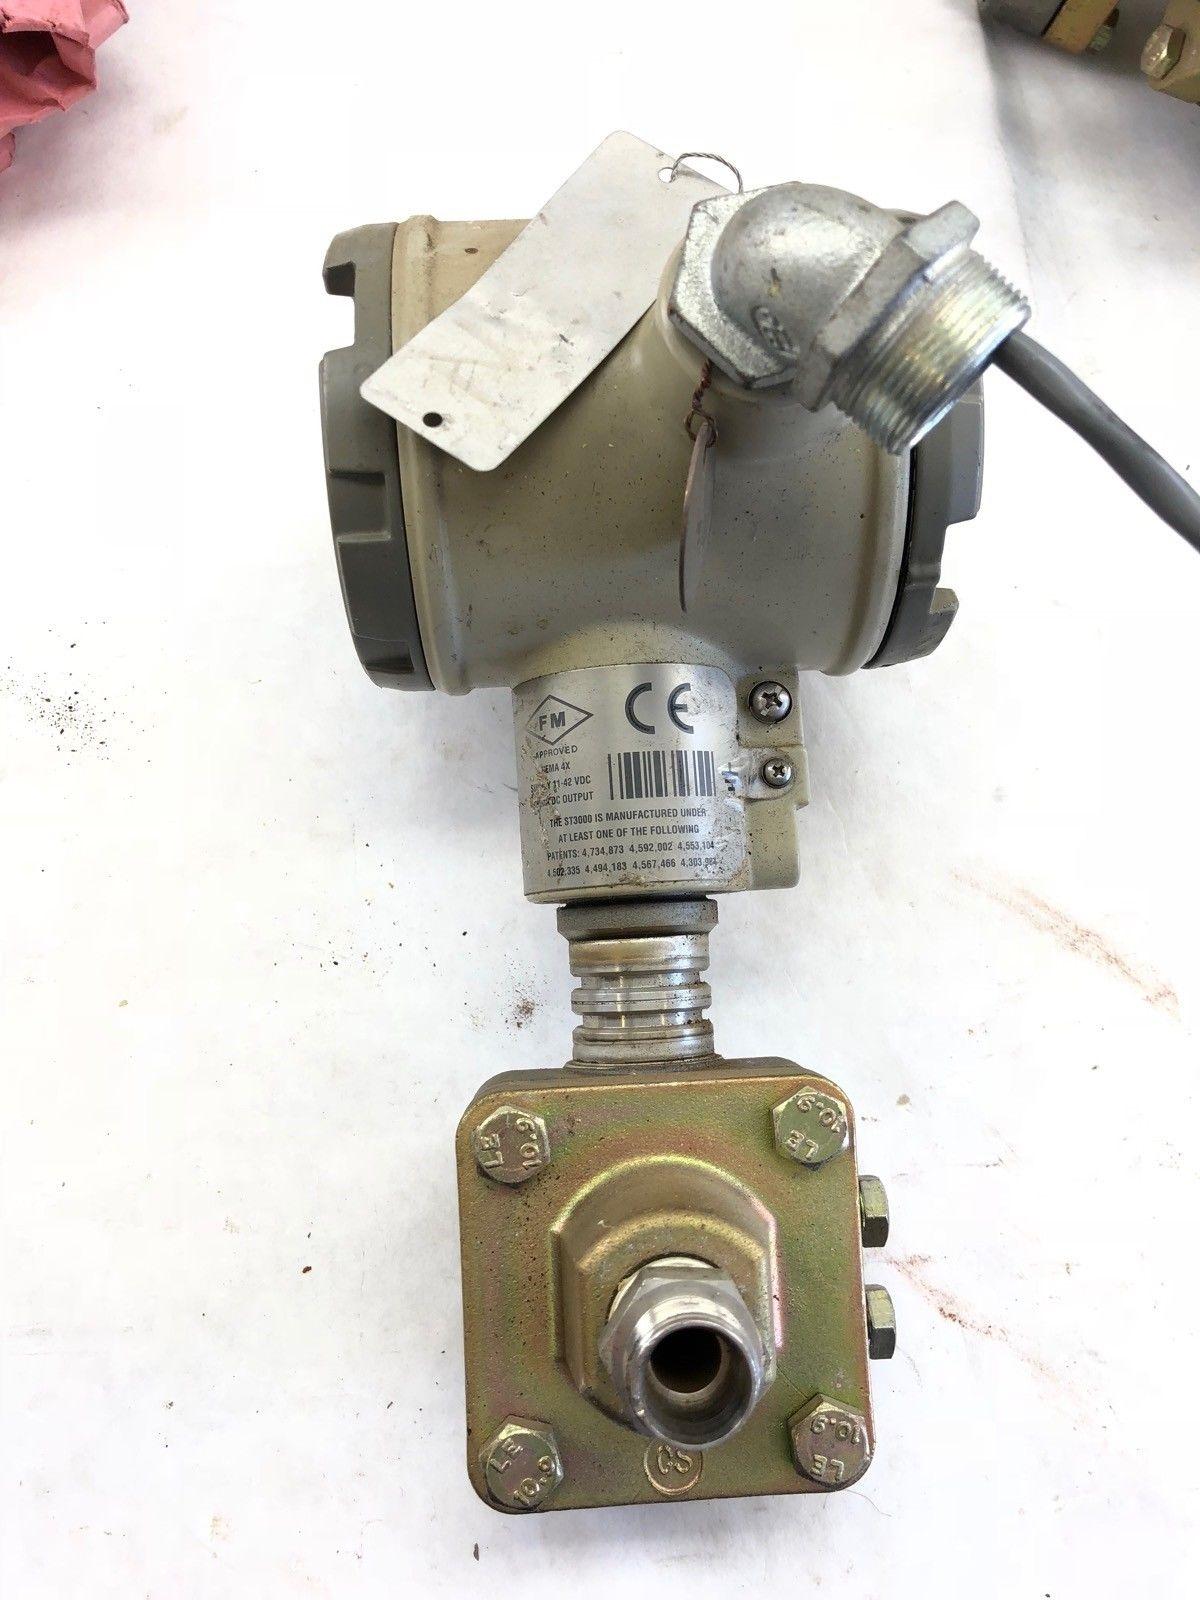 HONEYWELL ST3000 S900 R300 PRESSURE TRANSMITTER STA940-A1G STA940R-A10 (B444) 1